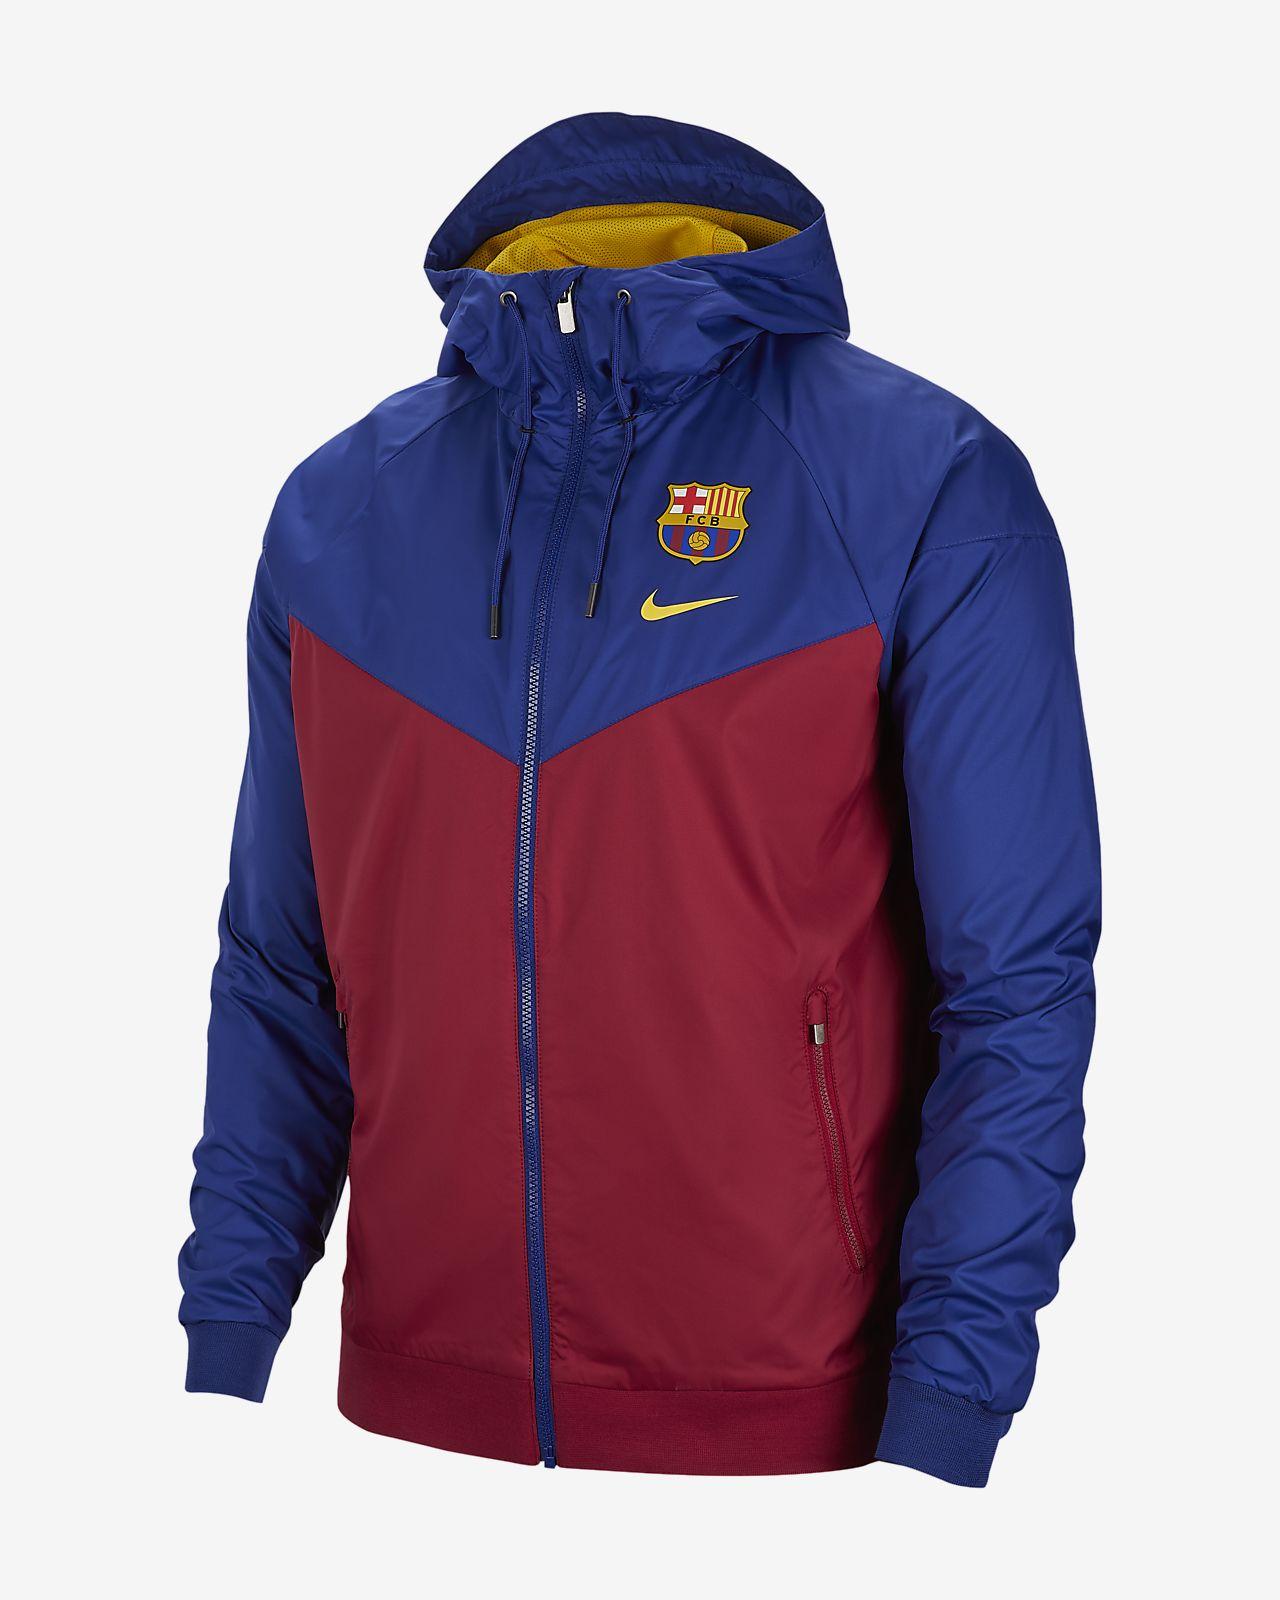 Blusão FC Barcelona Windrunner para homem